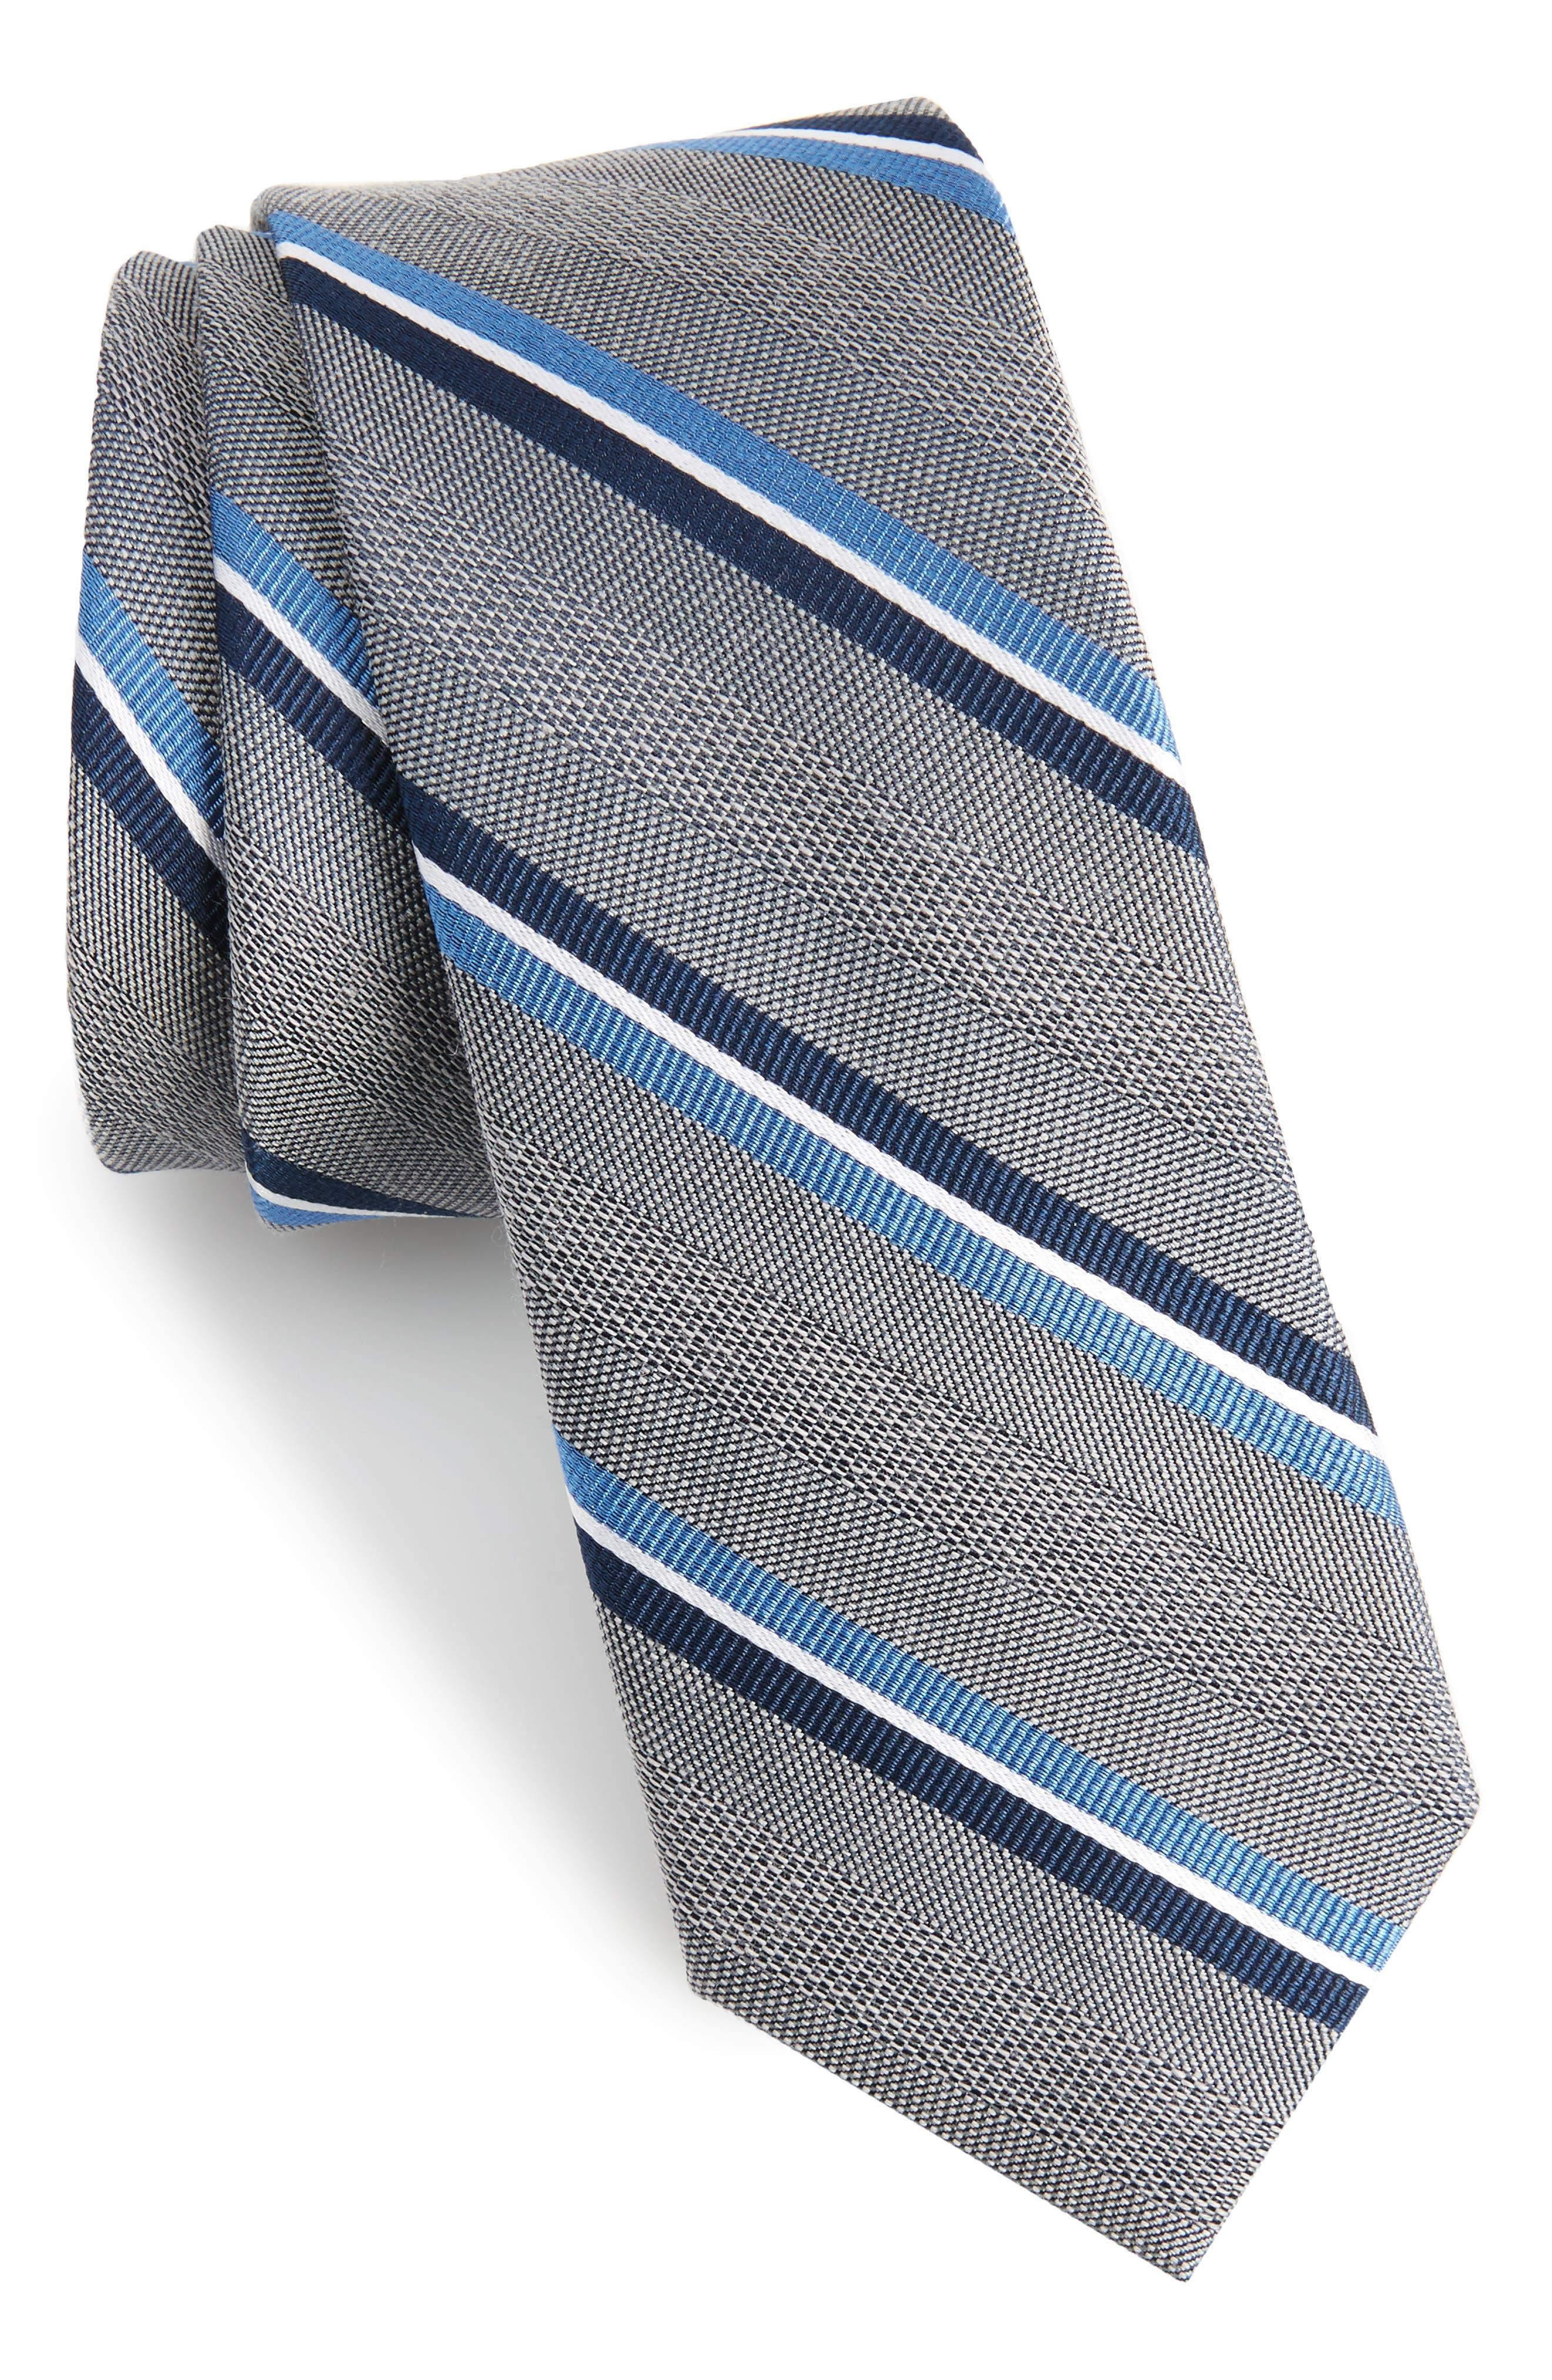 Short Cut Stripe Silk & Wool Skinny Tie,                             Main thumbnail 1, color,                             030